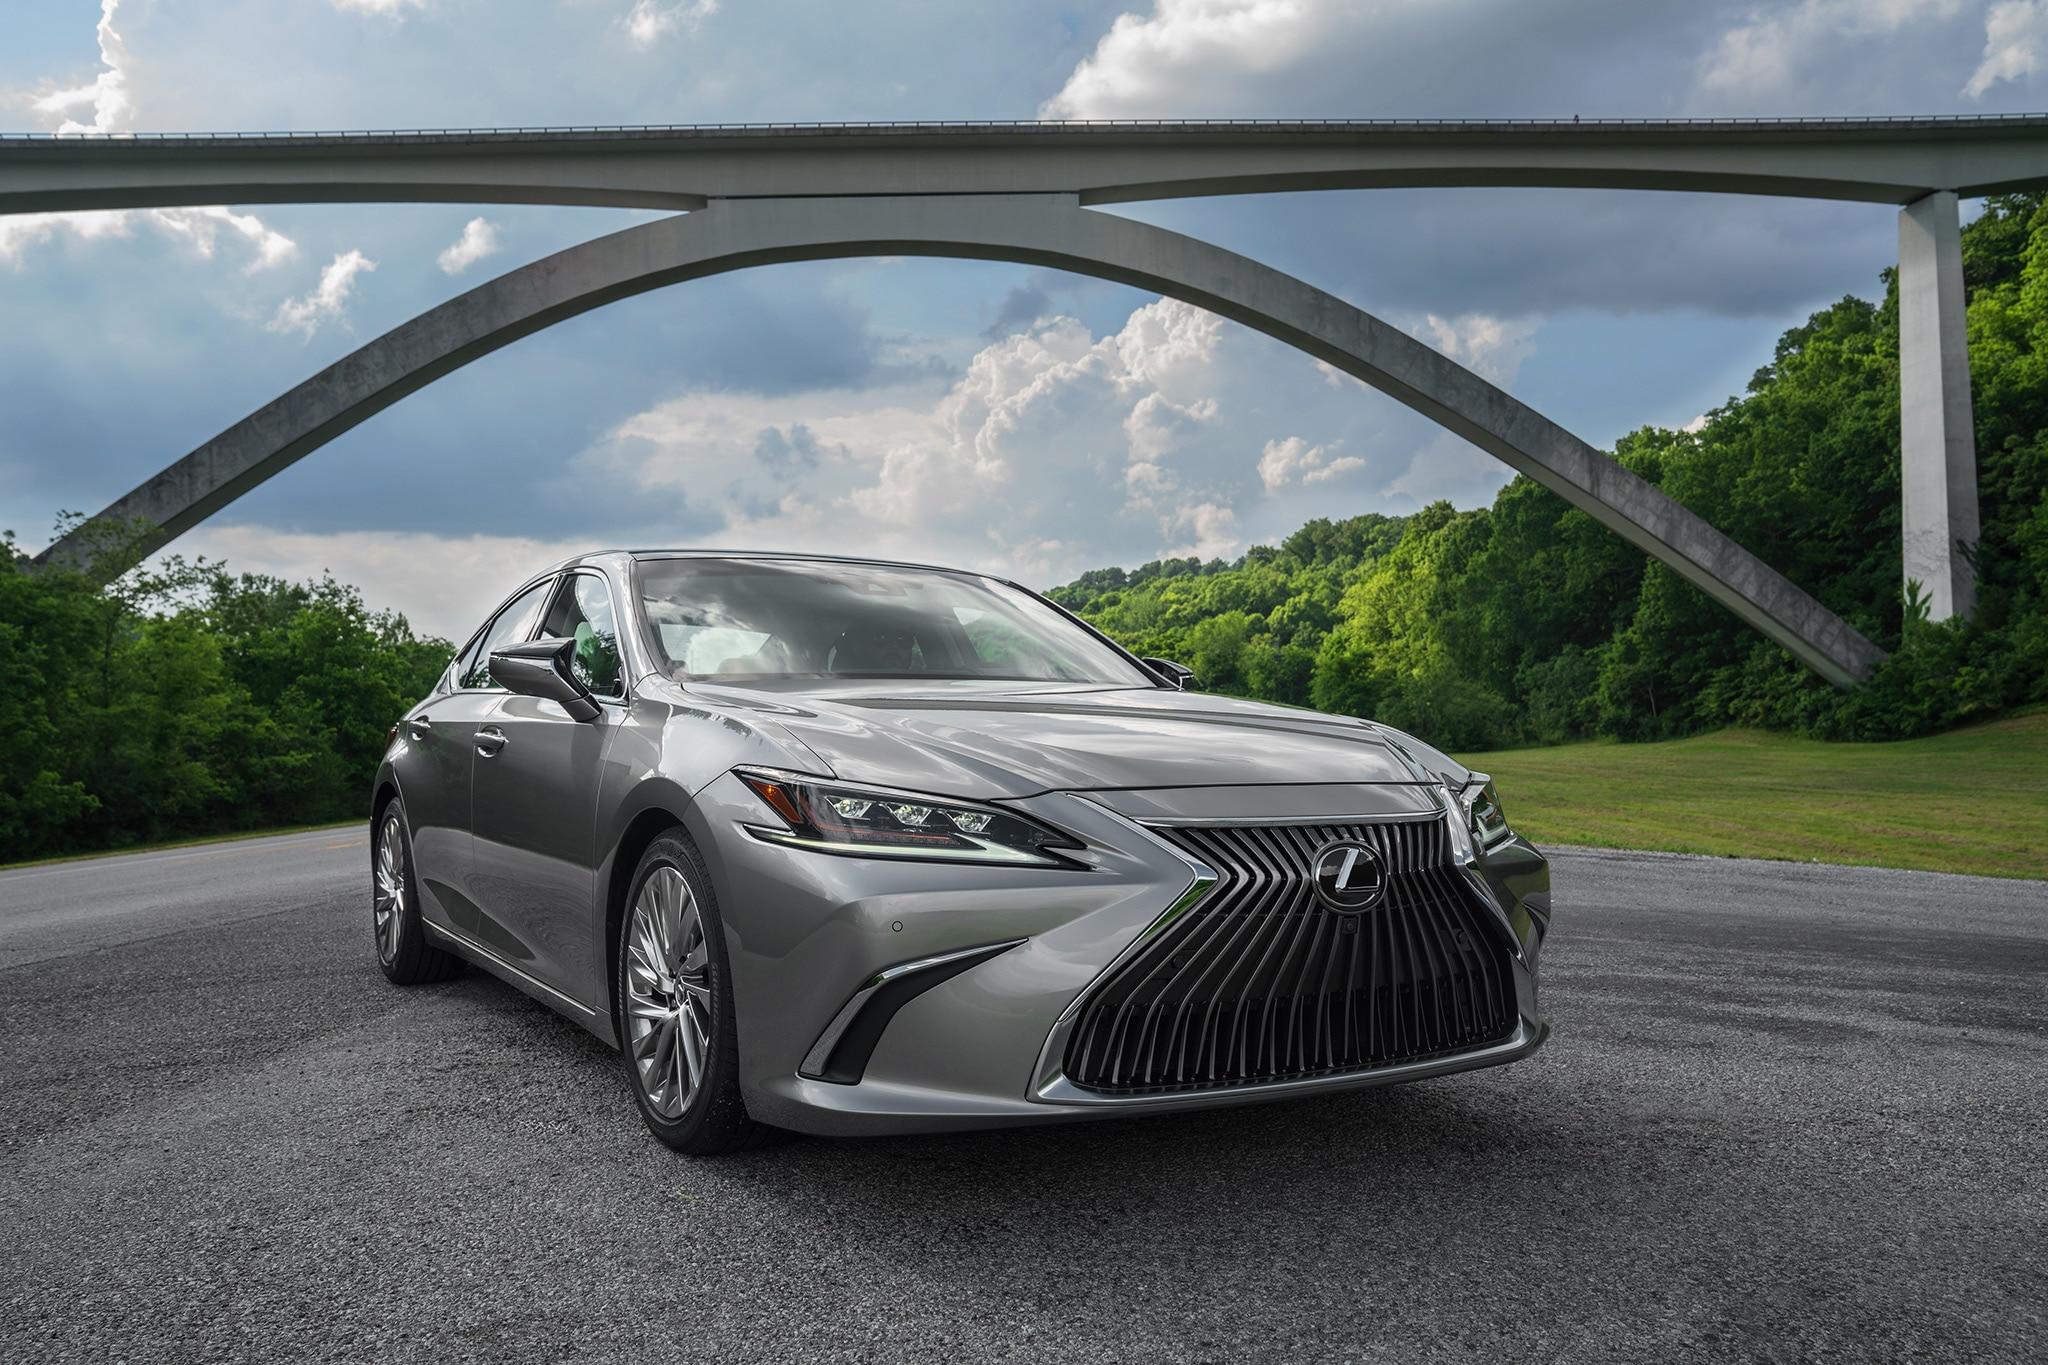 2019 lexus es 350 first drive review